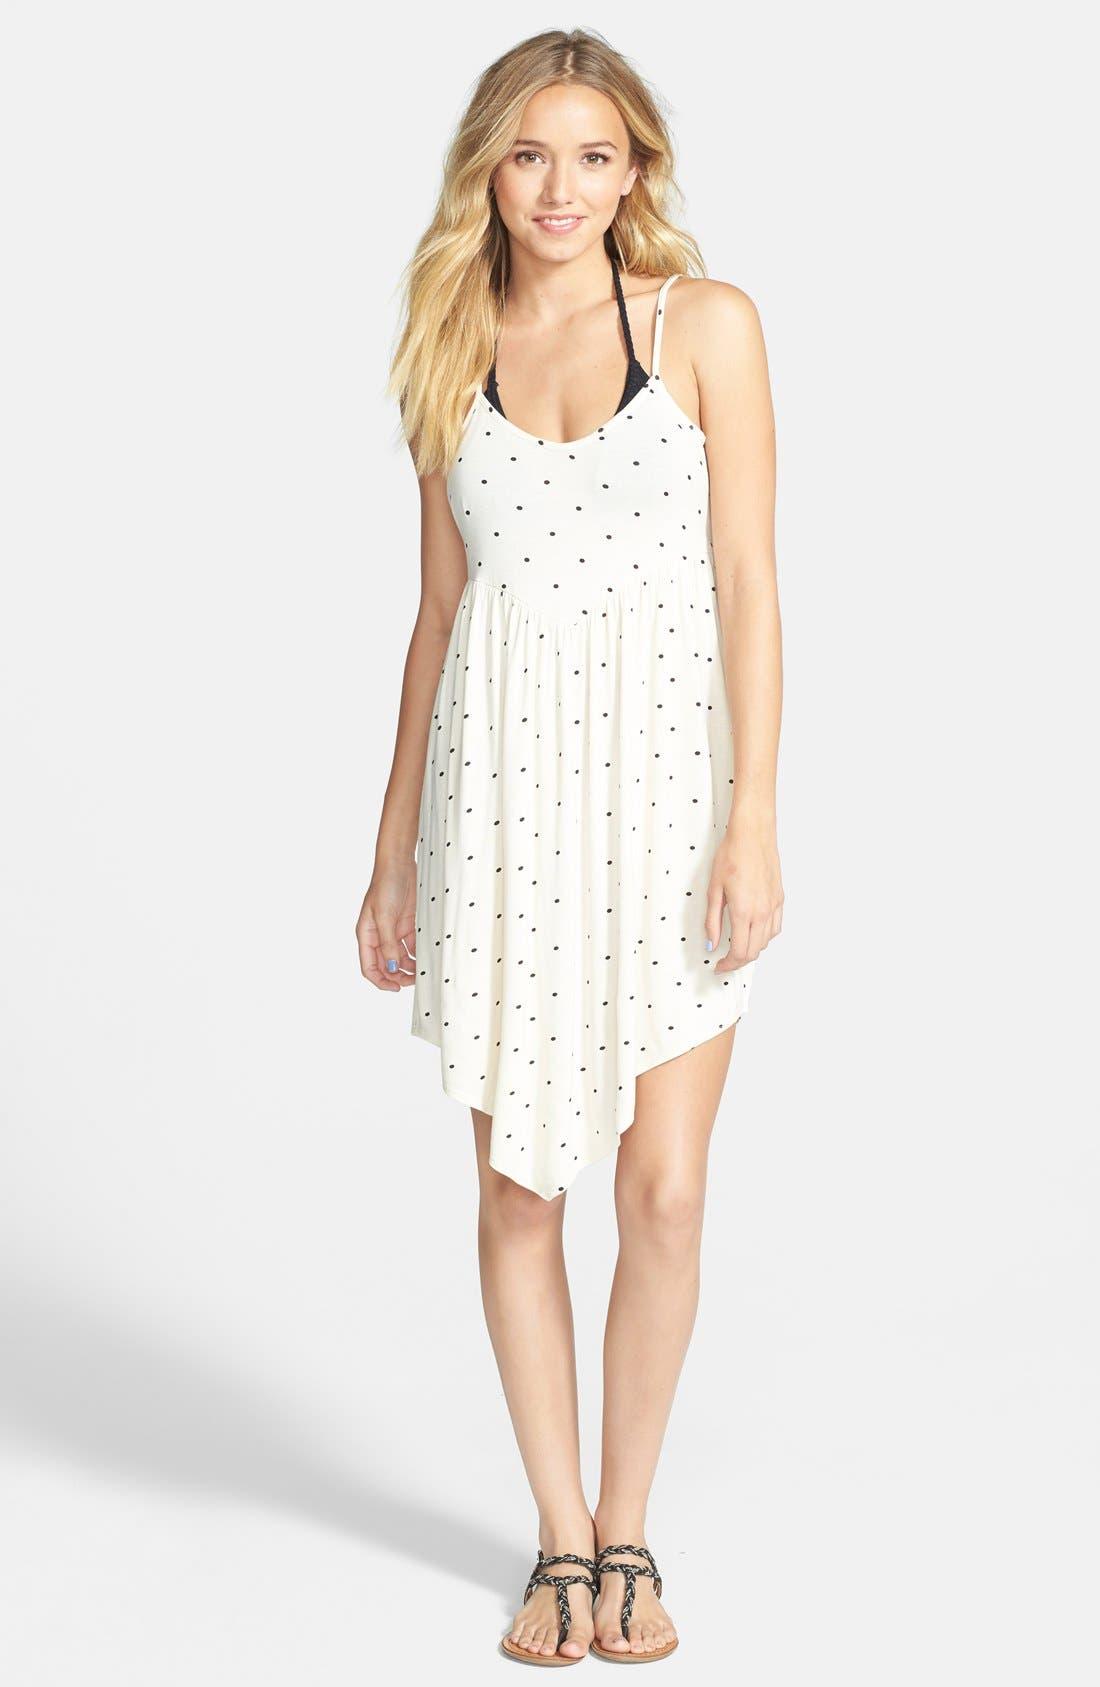 Alternate Image 1 Selected - Volcom 'Burn Free' Print Low Back Dress